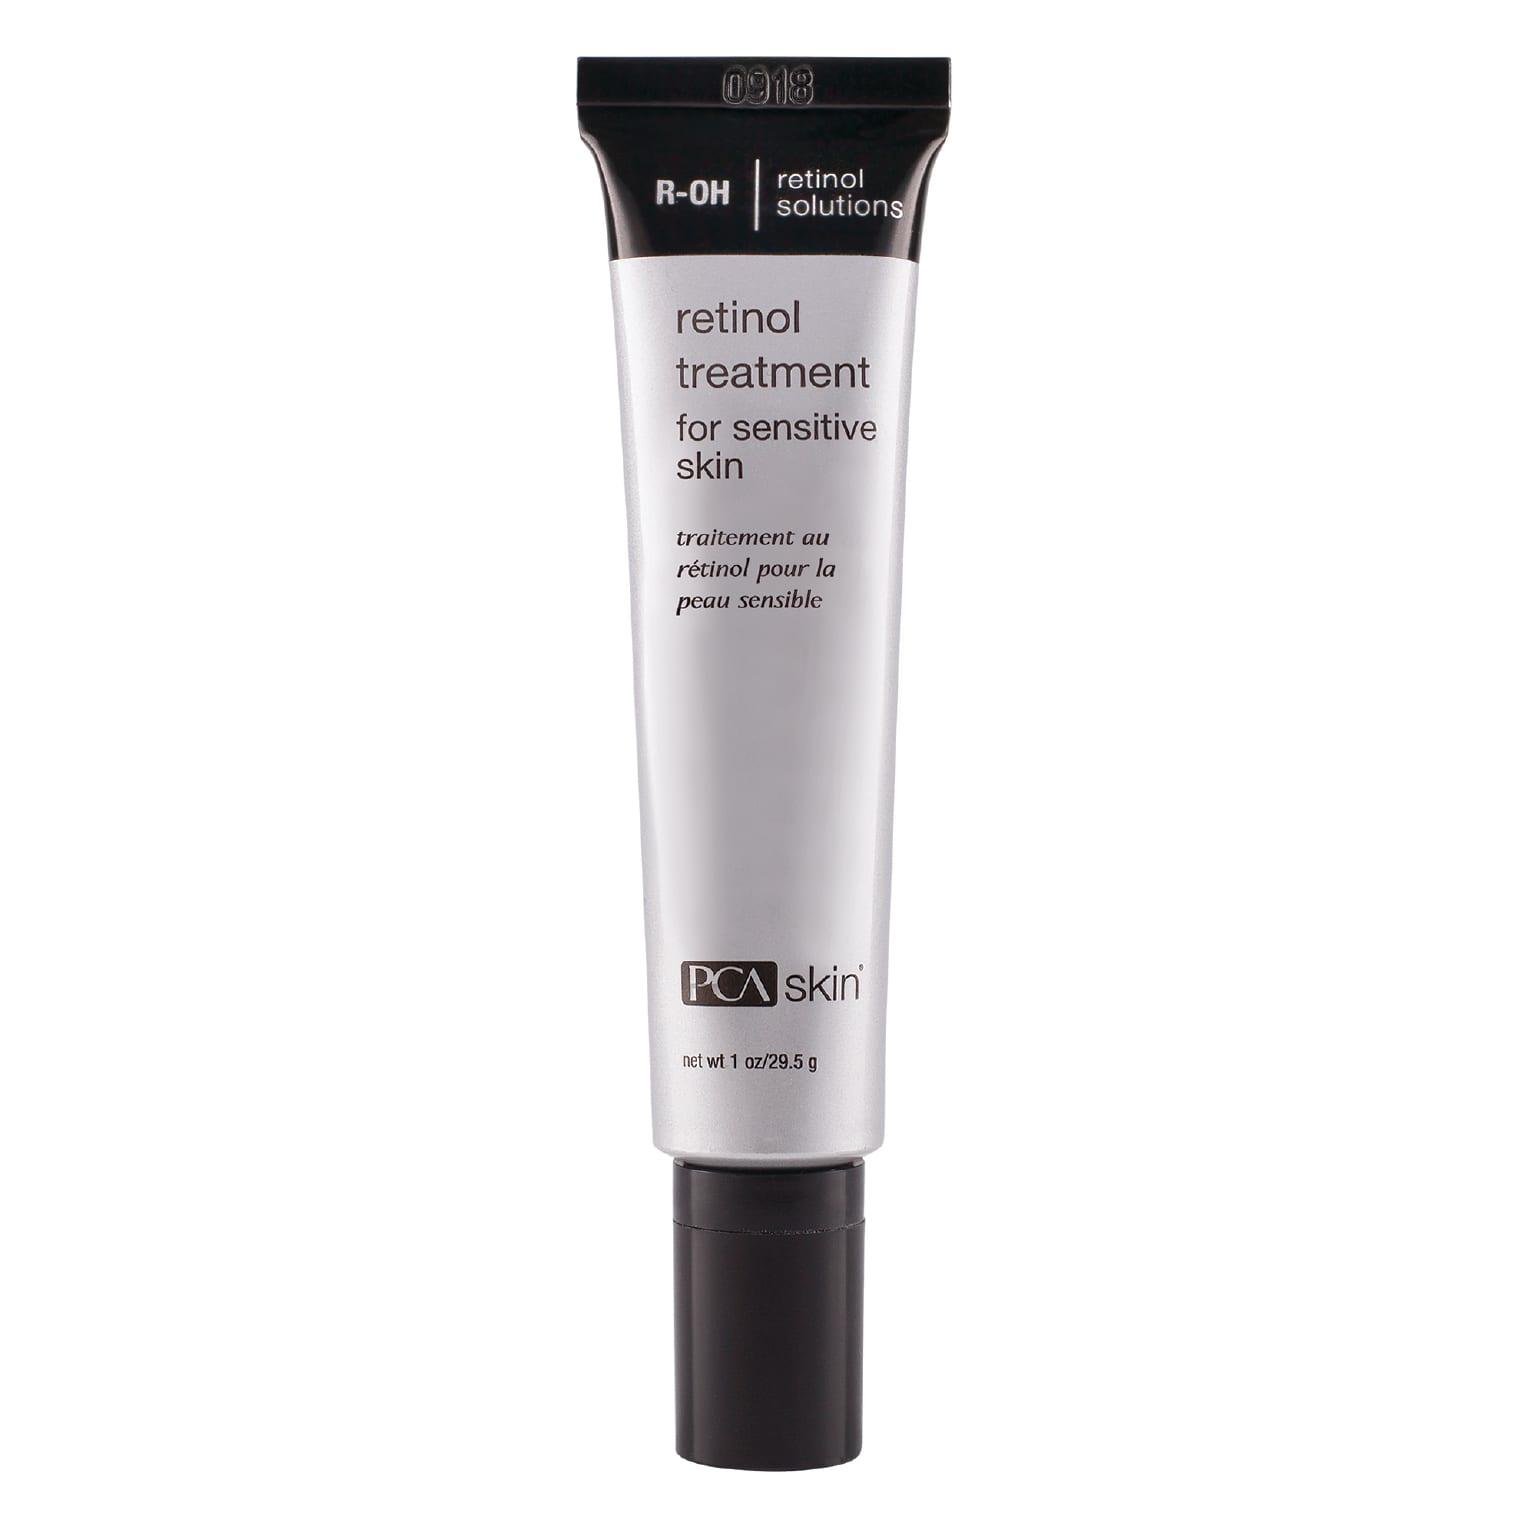 PCA Skin - Retinol Treatment